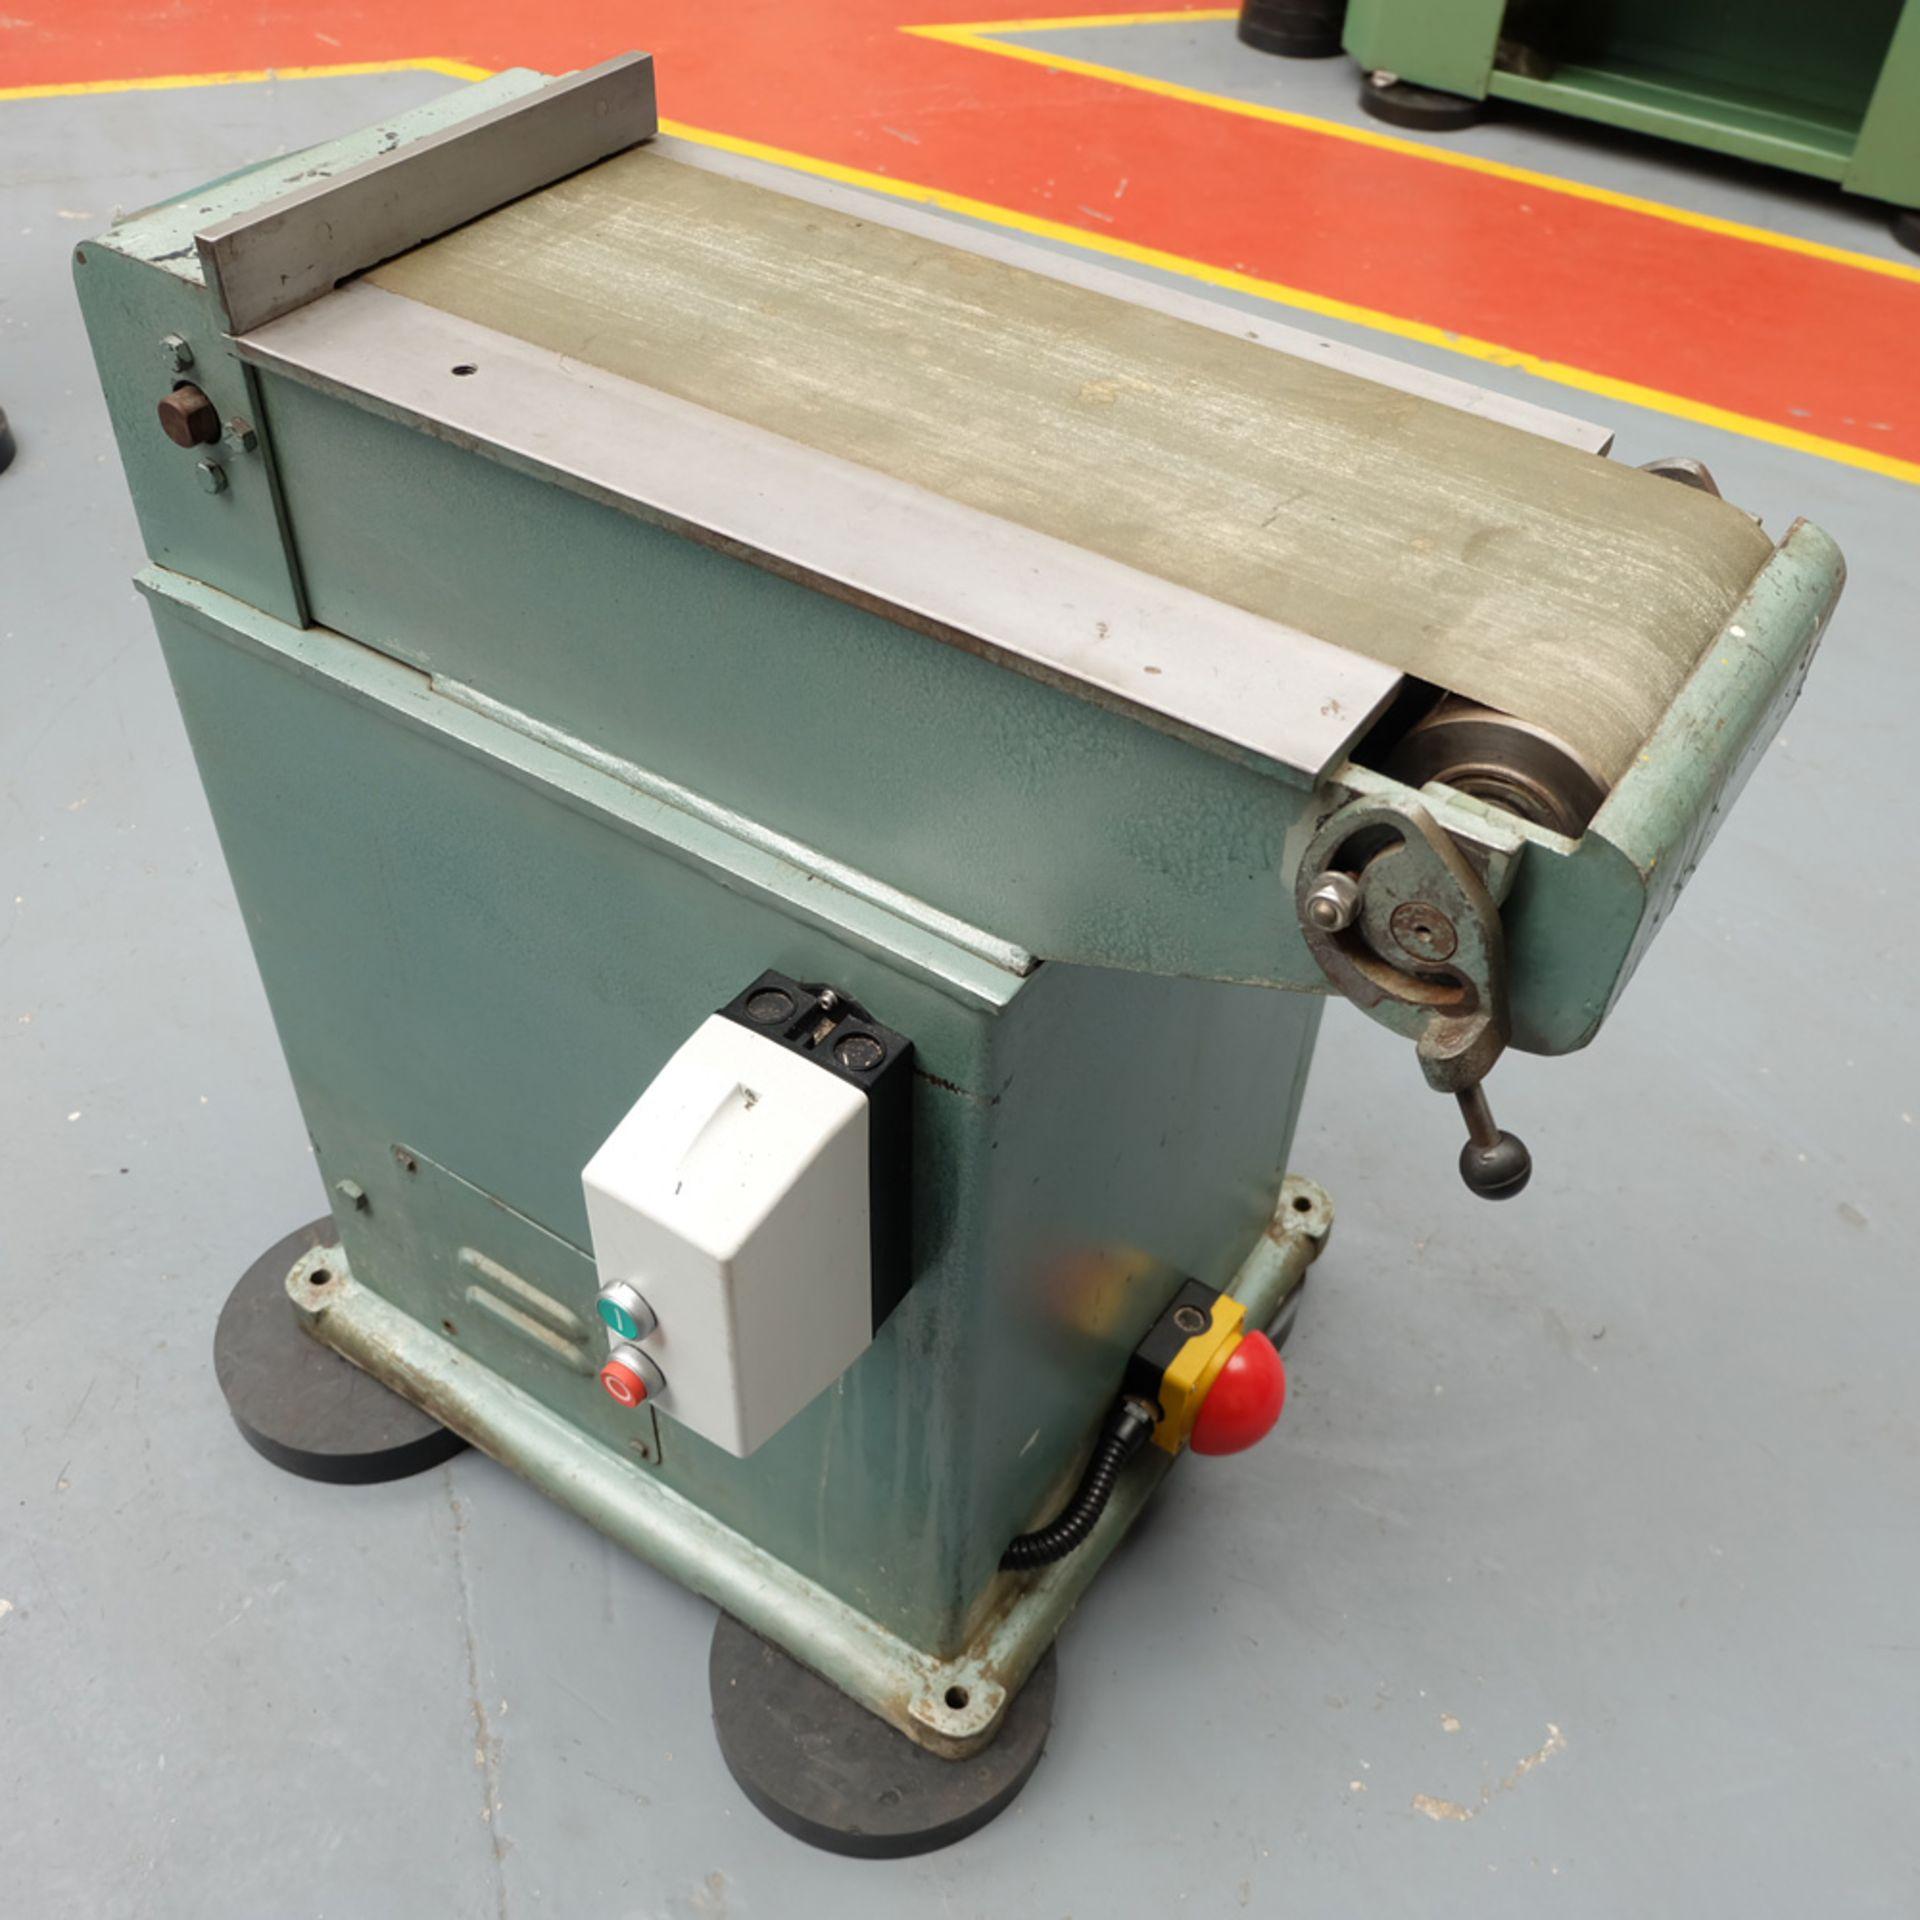 RJH Model 'Moose' Heavy Duty Horizontal Bandfacing / Linishing Machine. - Image 4 of 7